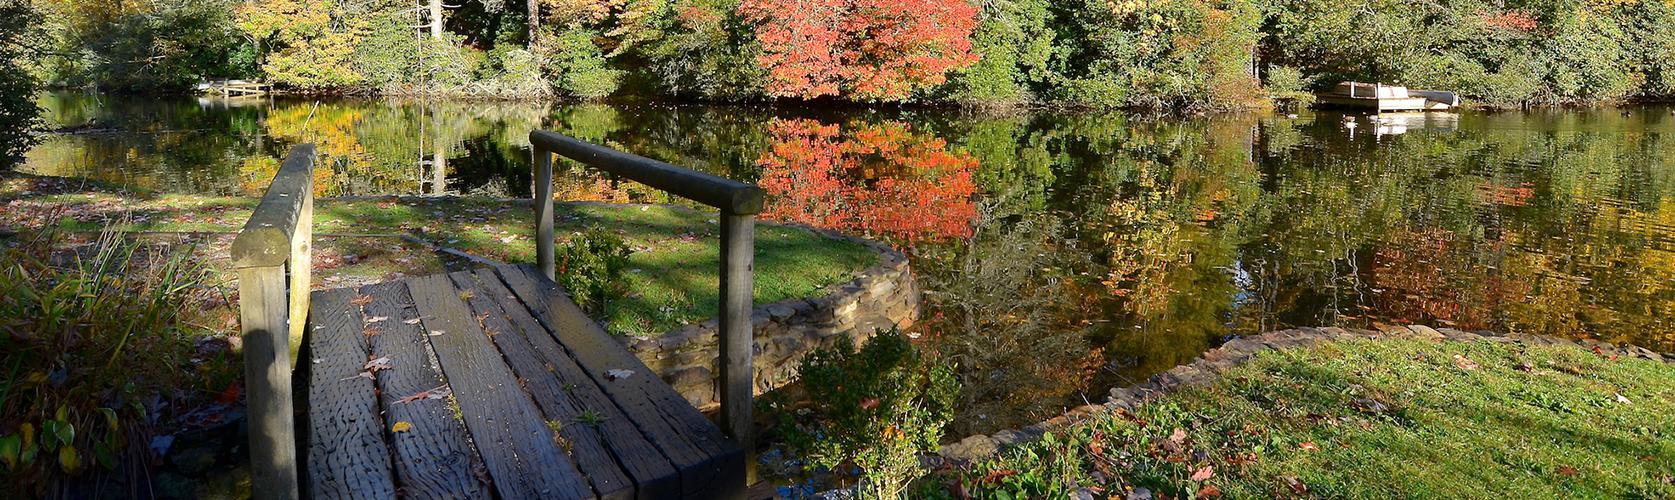 highlands-nc-fall-season.jpg